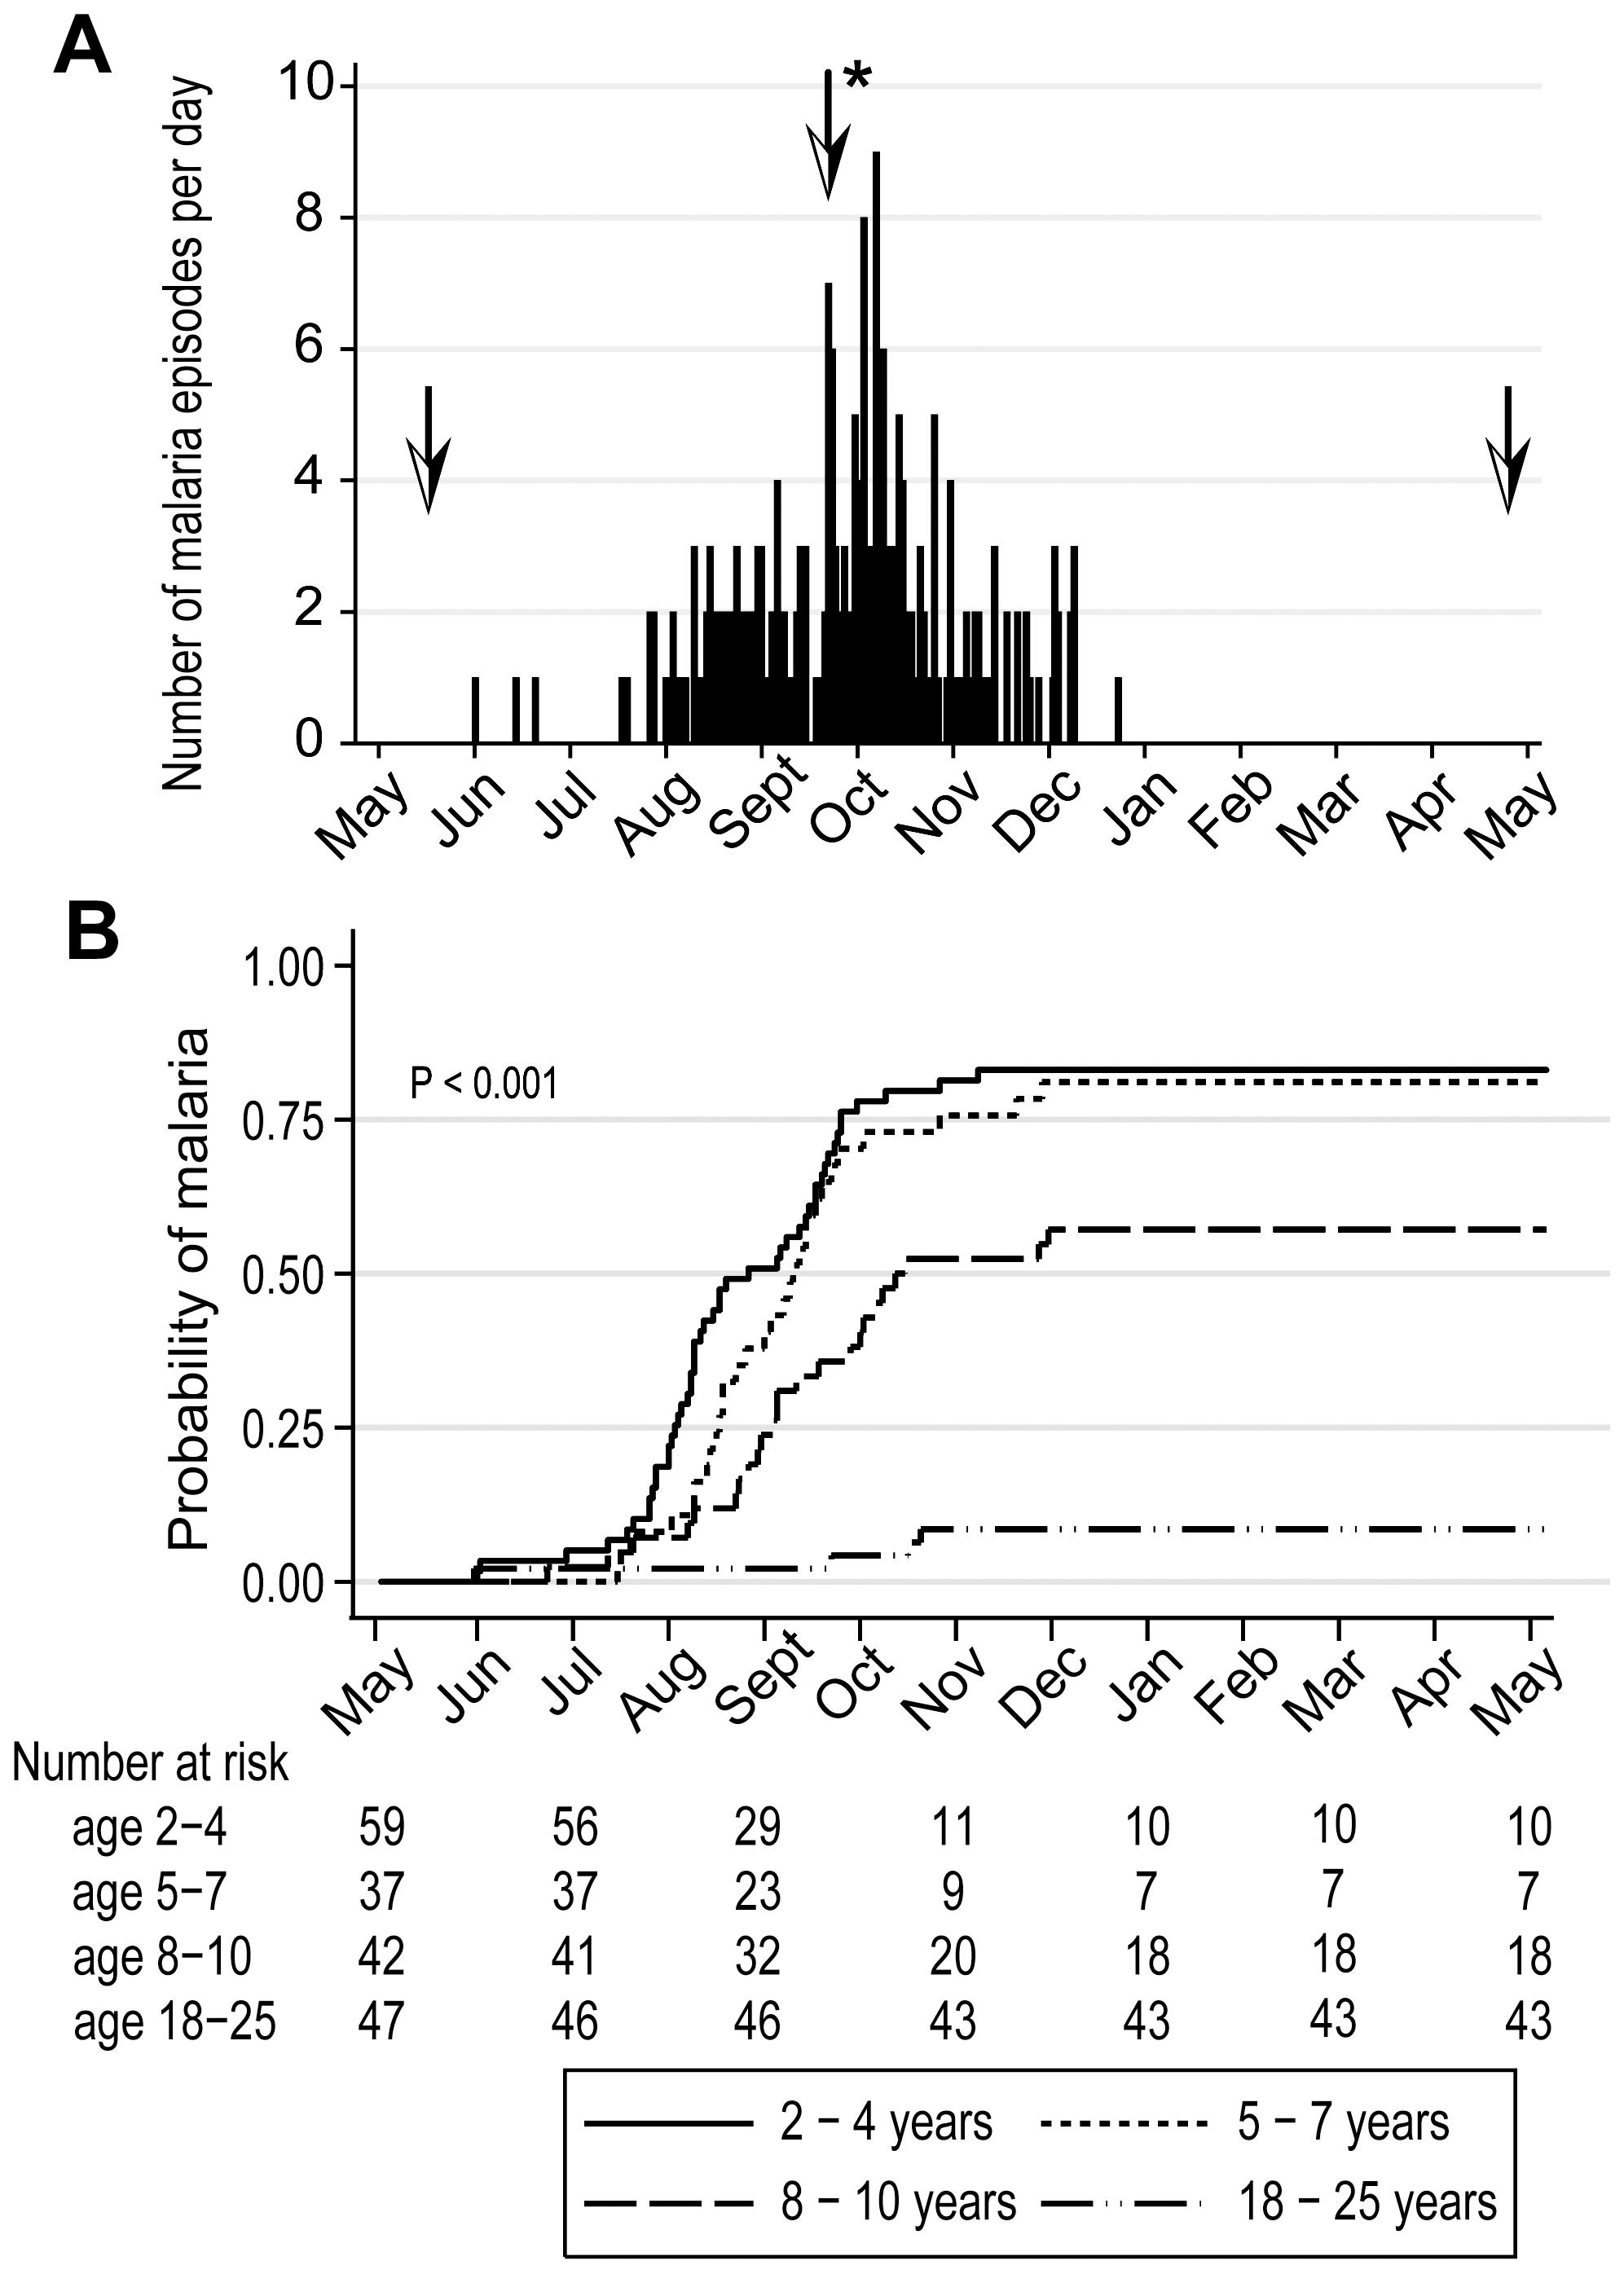 Malaria immunity is acquired gradually despite intense annual exposure to the <i>Pf</i> parasite.